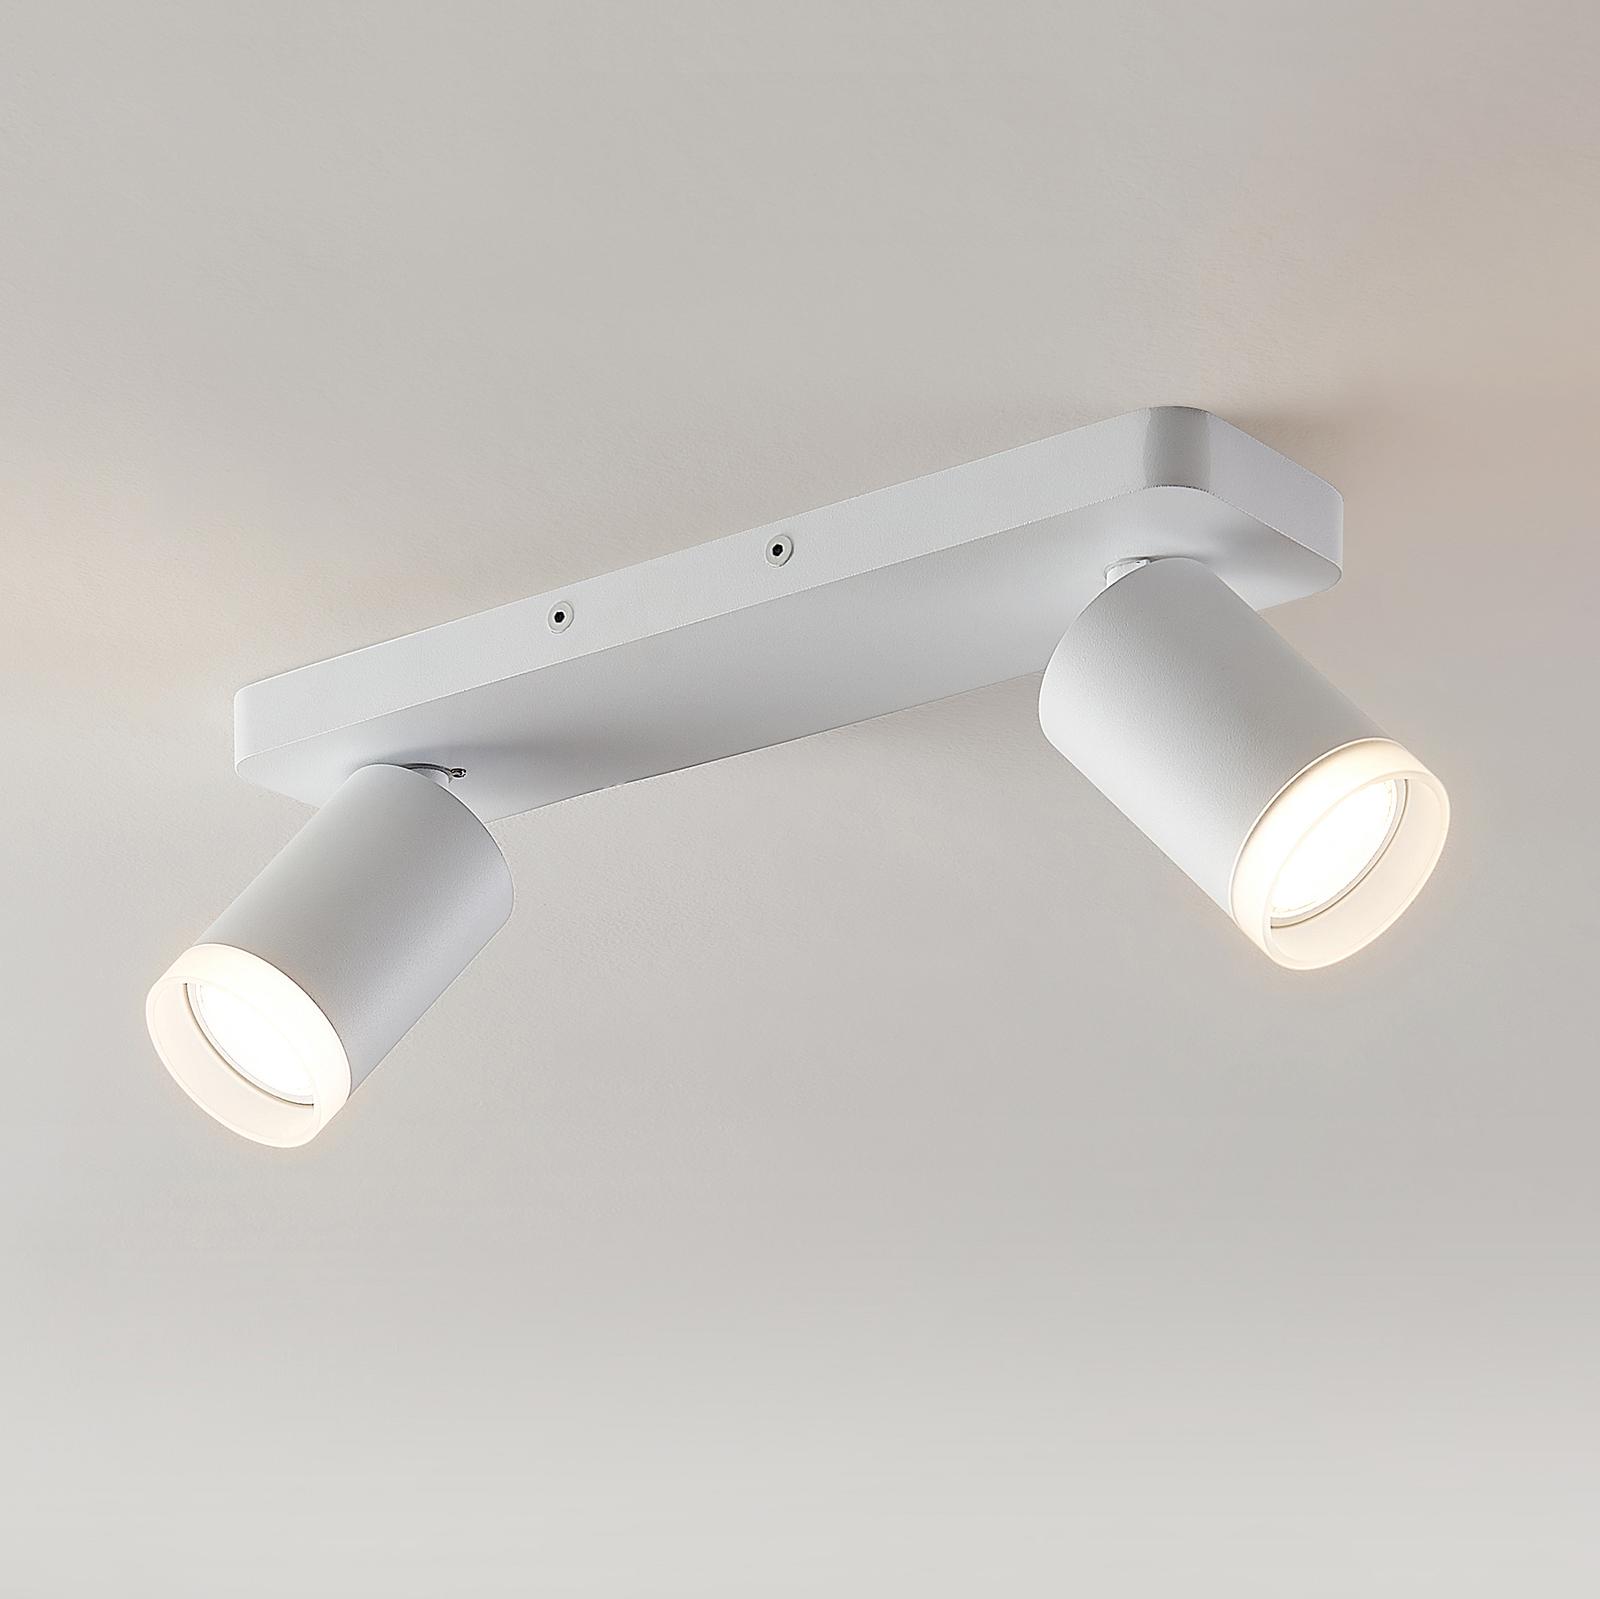 Arcchio Efilius takspotlight, vit, 2 lampor